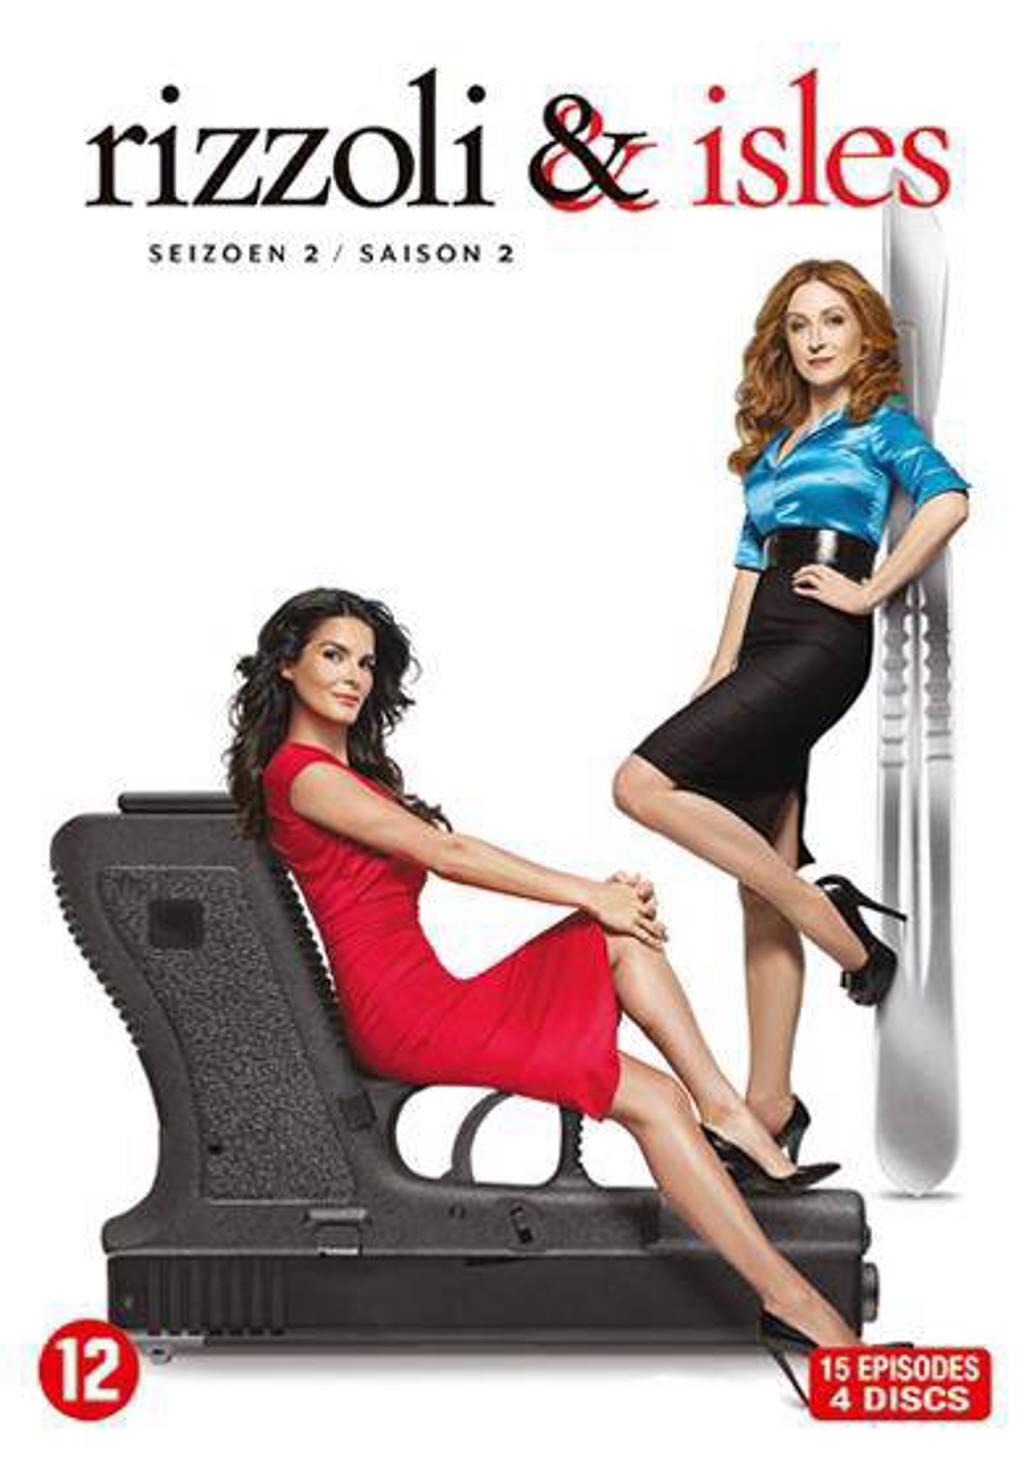 Rizzoli & Isles - Seizoen 2 (DVD)